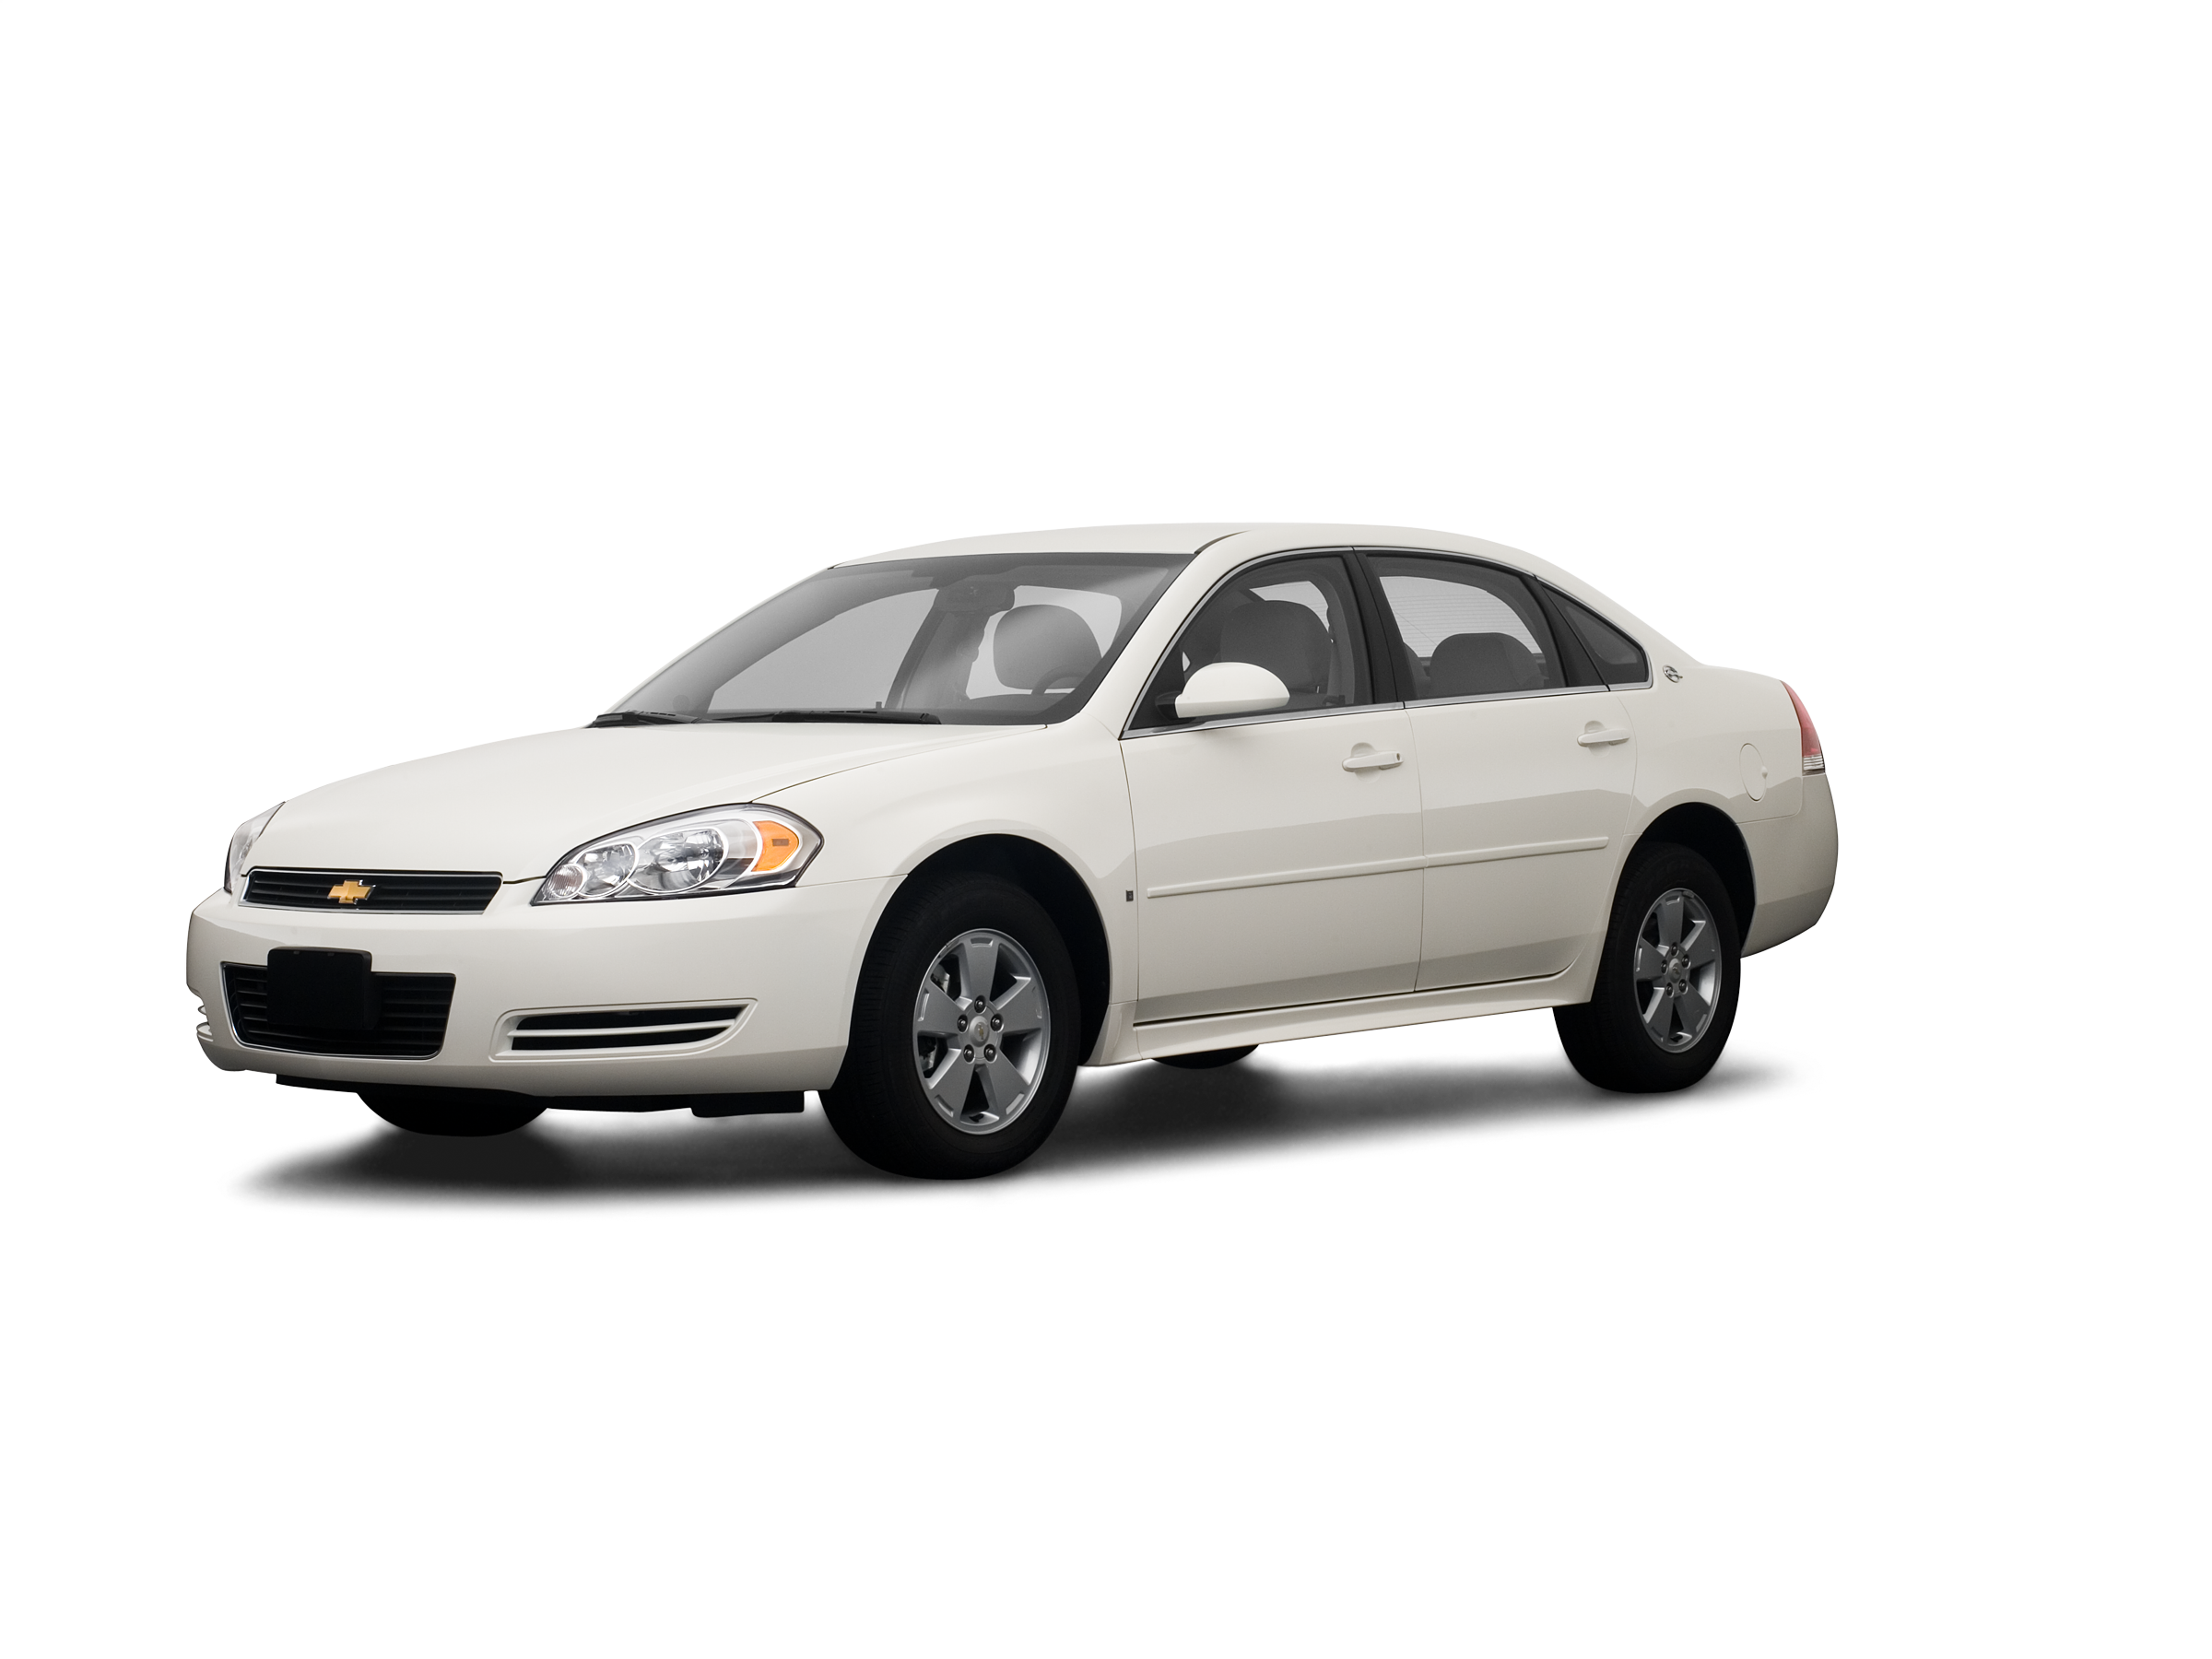 2009 Chevrolet Impala Values Cars For Sale Kelley Blue Book